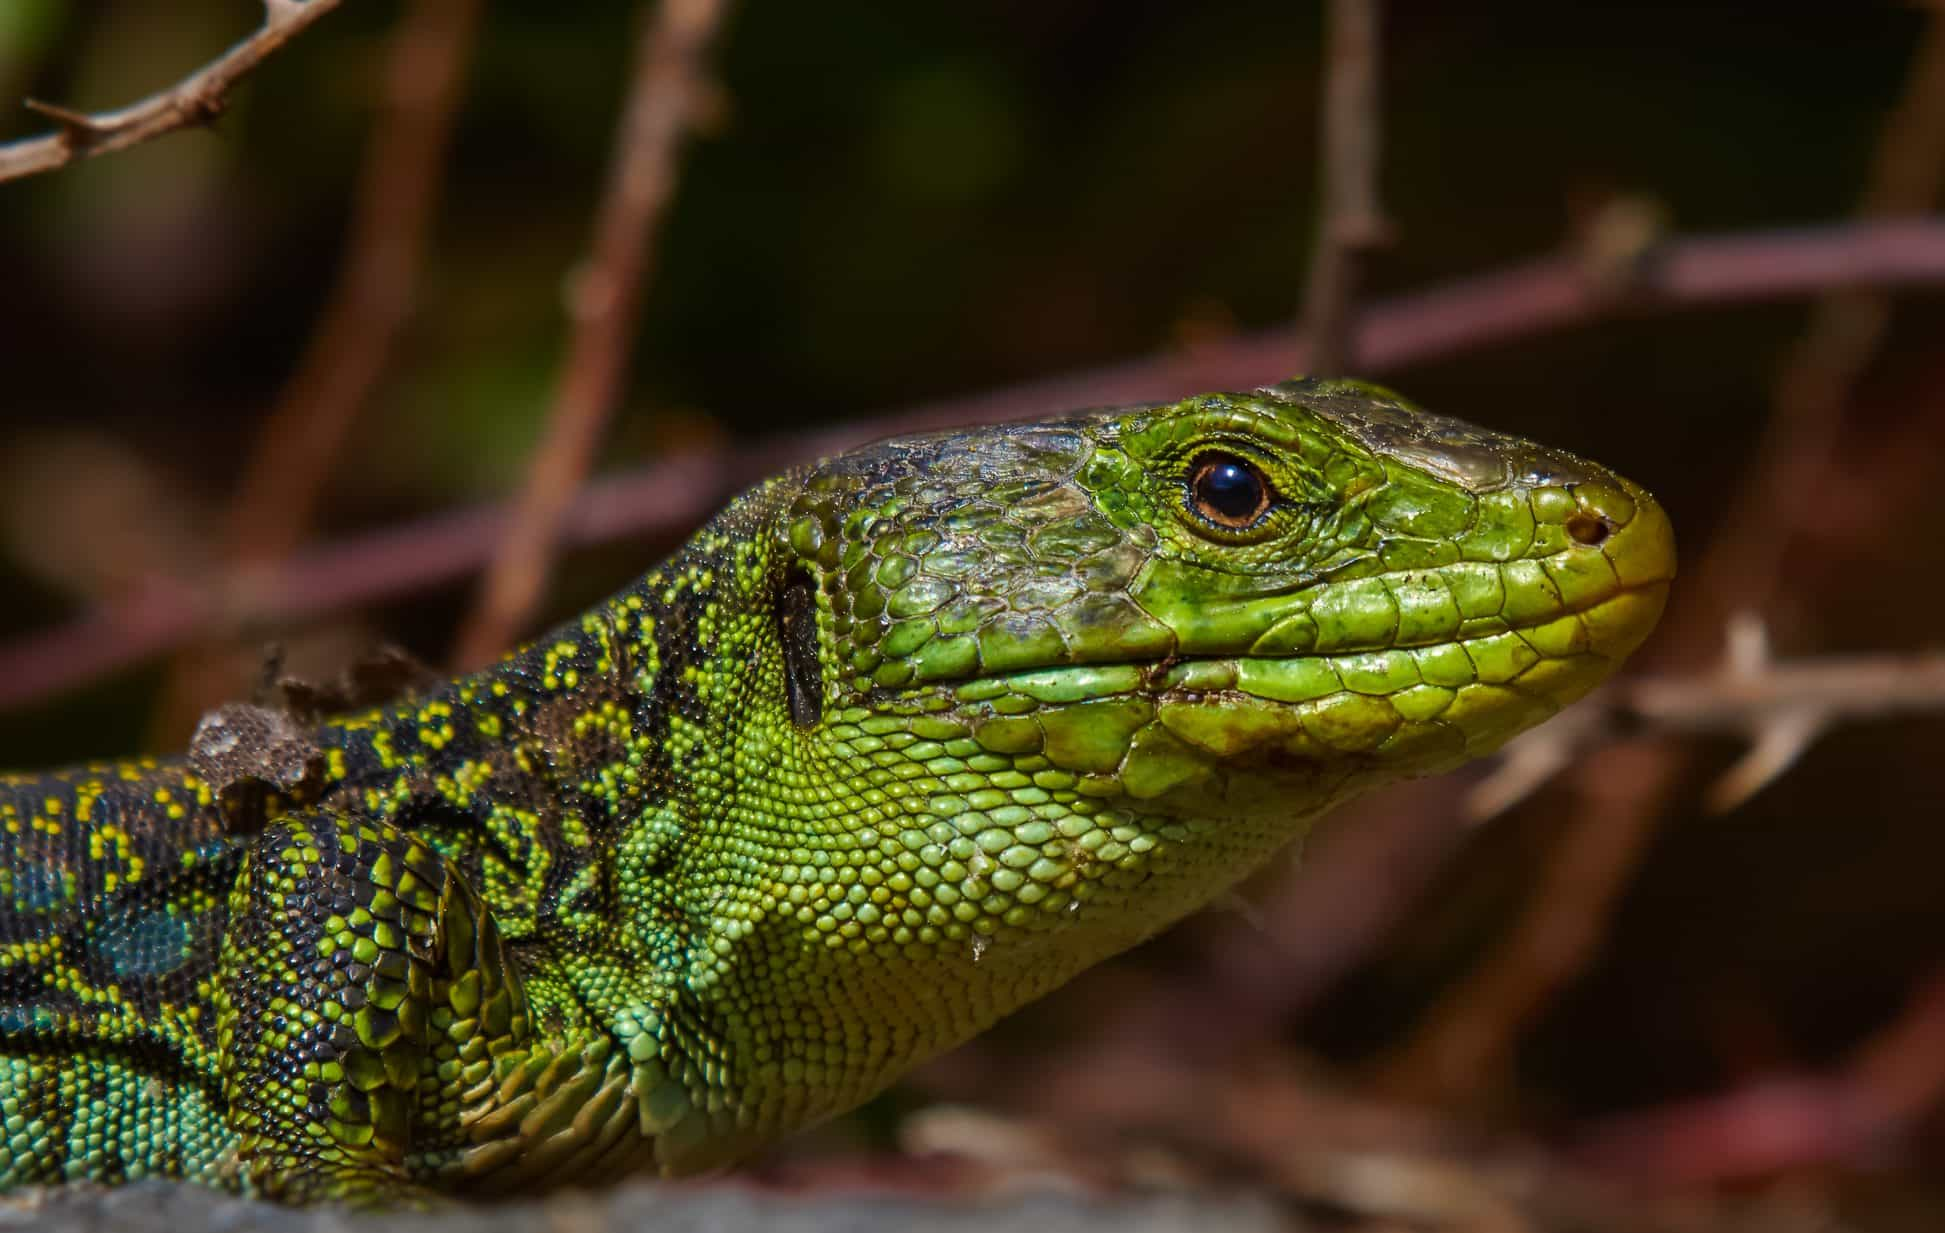 reptile pet lizard camouflage animal wild nature wildlife eye reptiles lizards geckos animals dragon 1233 1945 kb